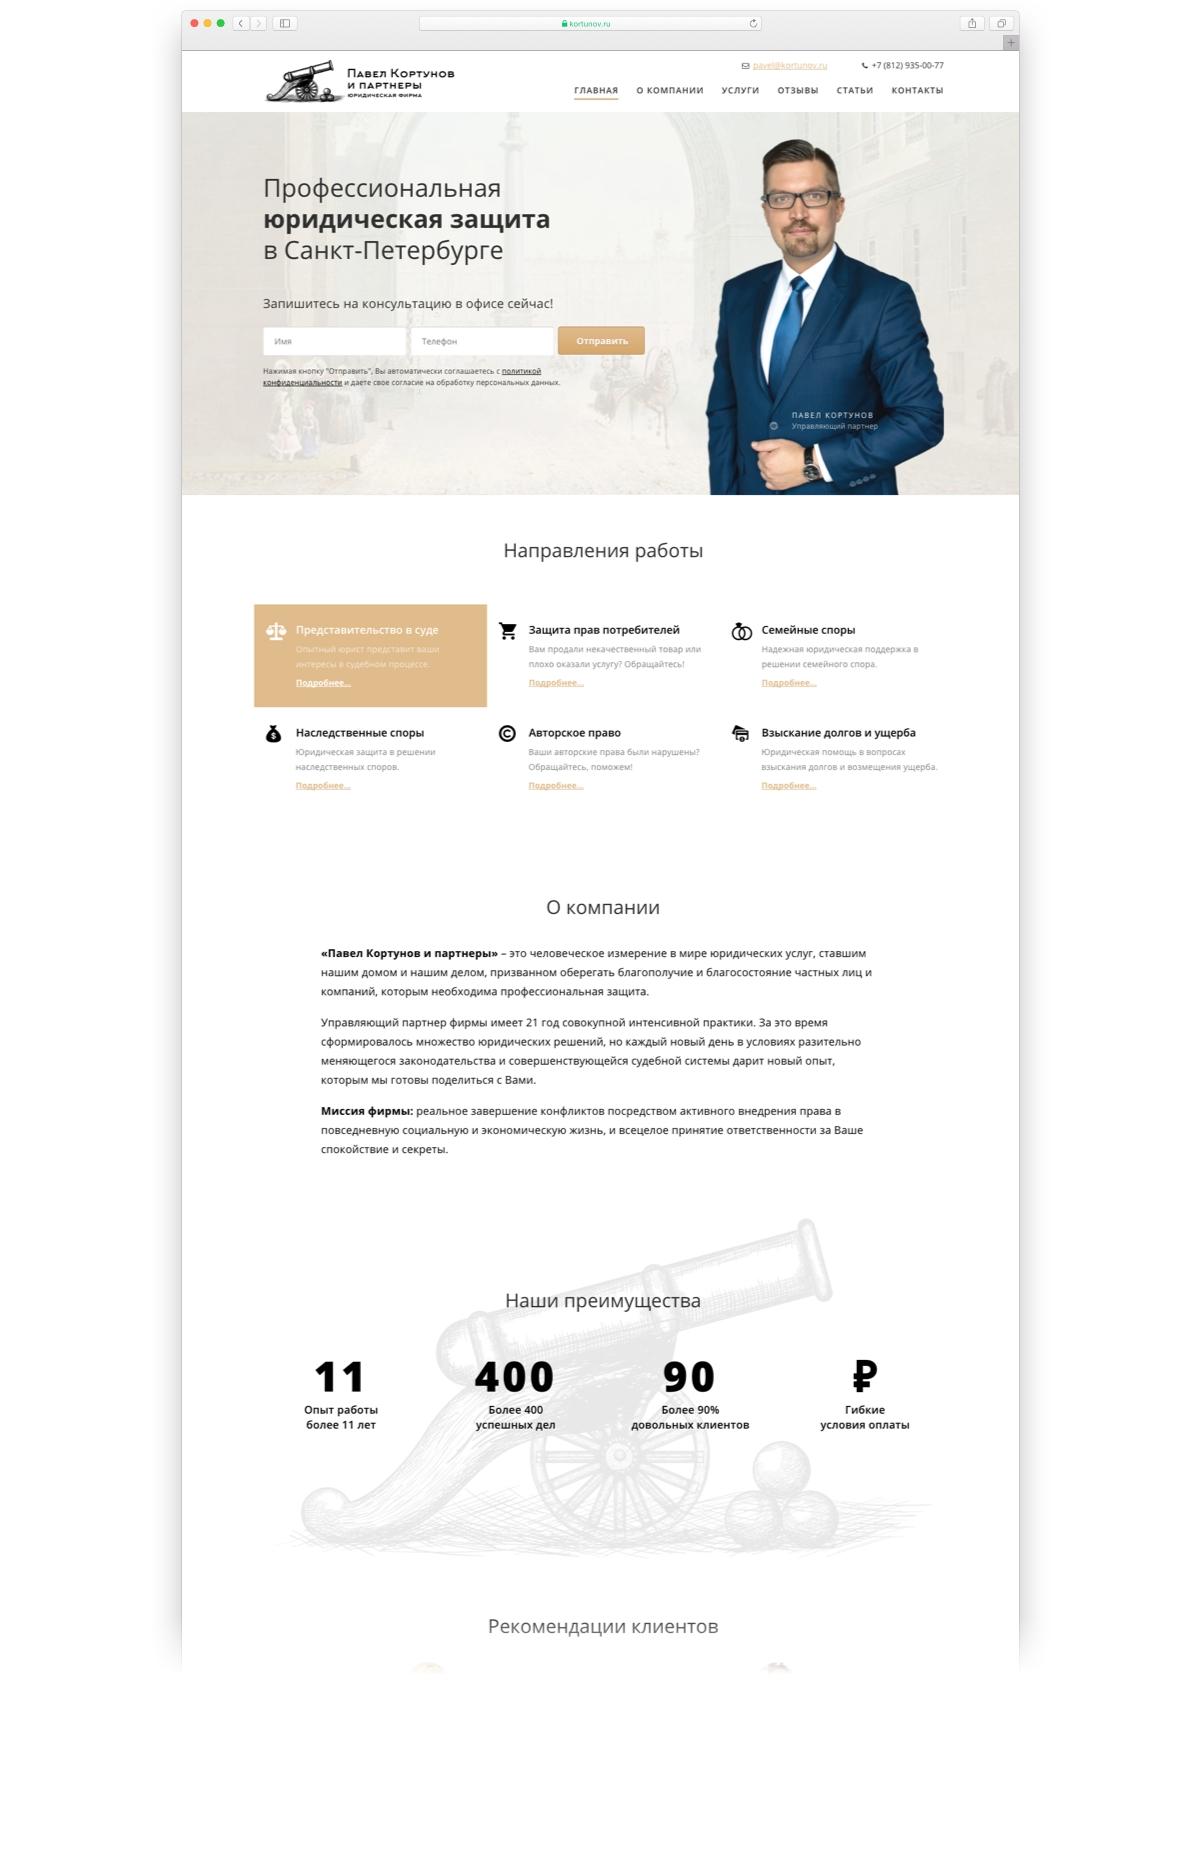 kortunov_page_1